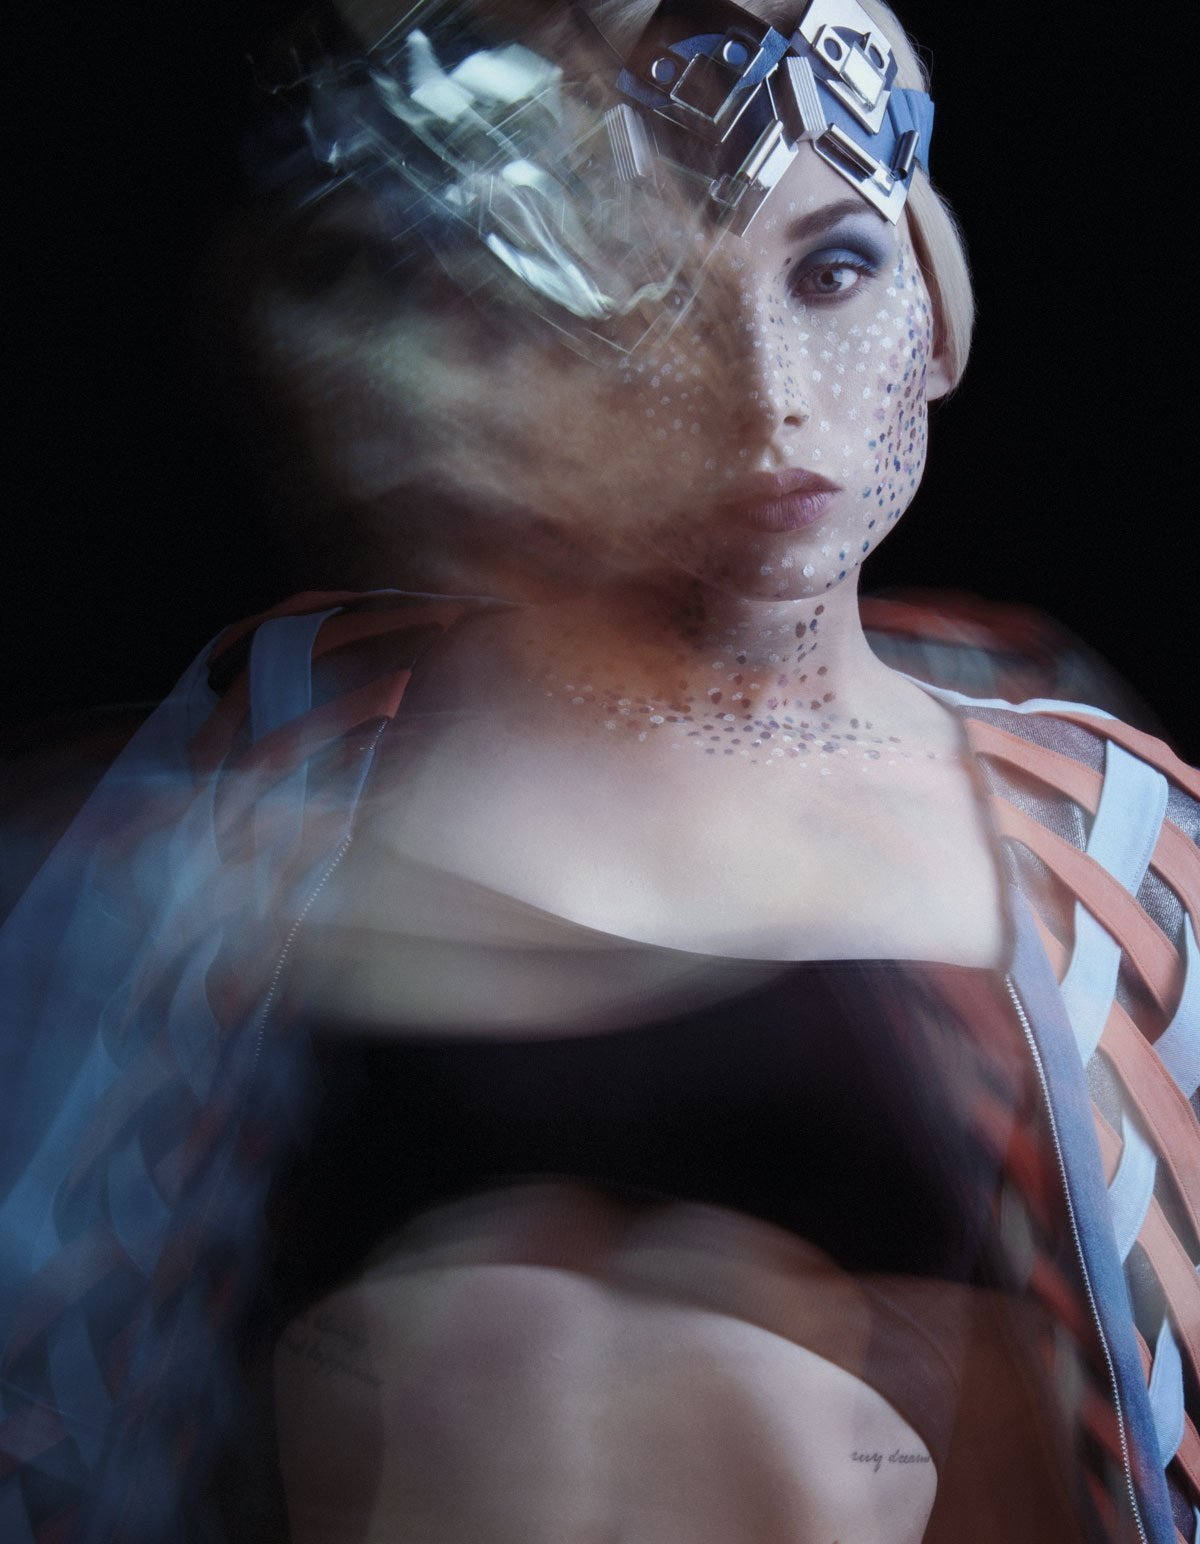 Moda andrógina